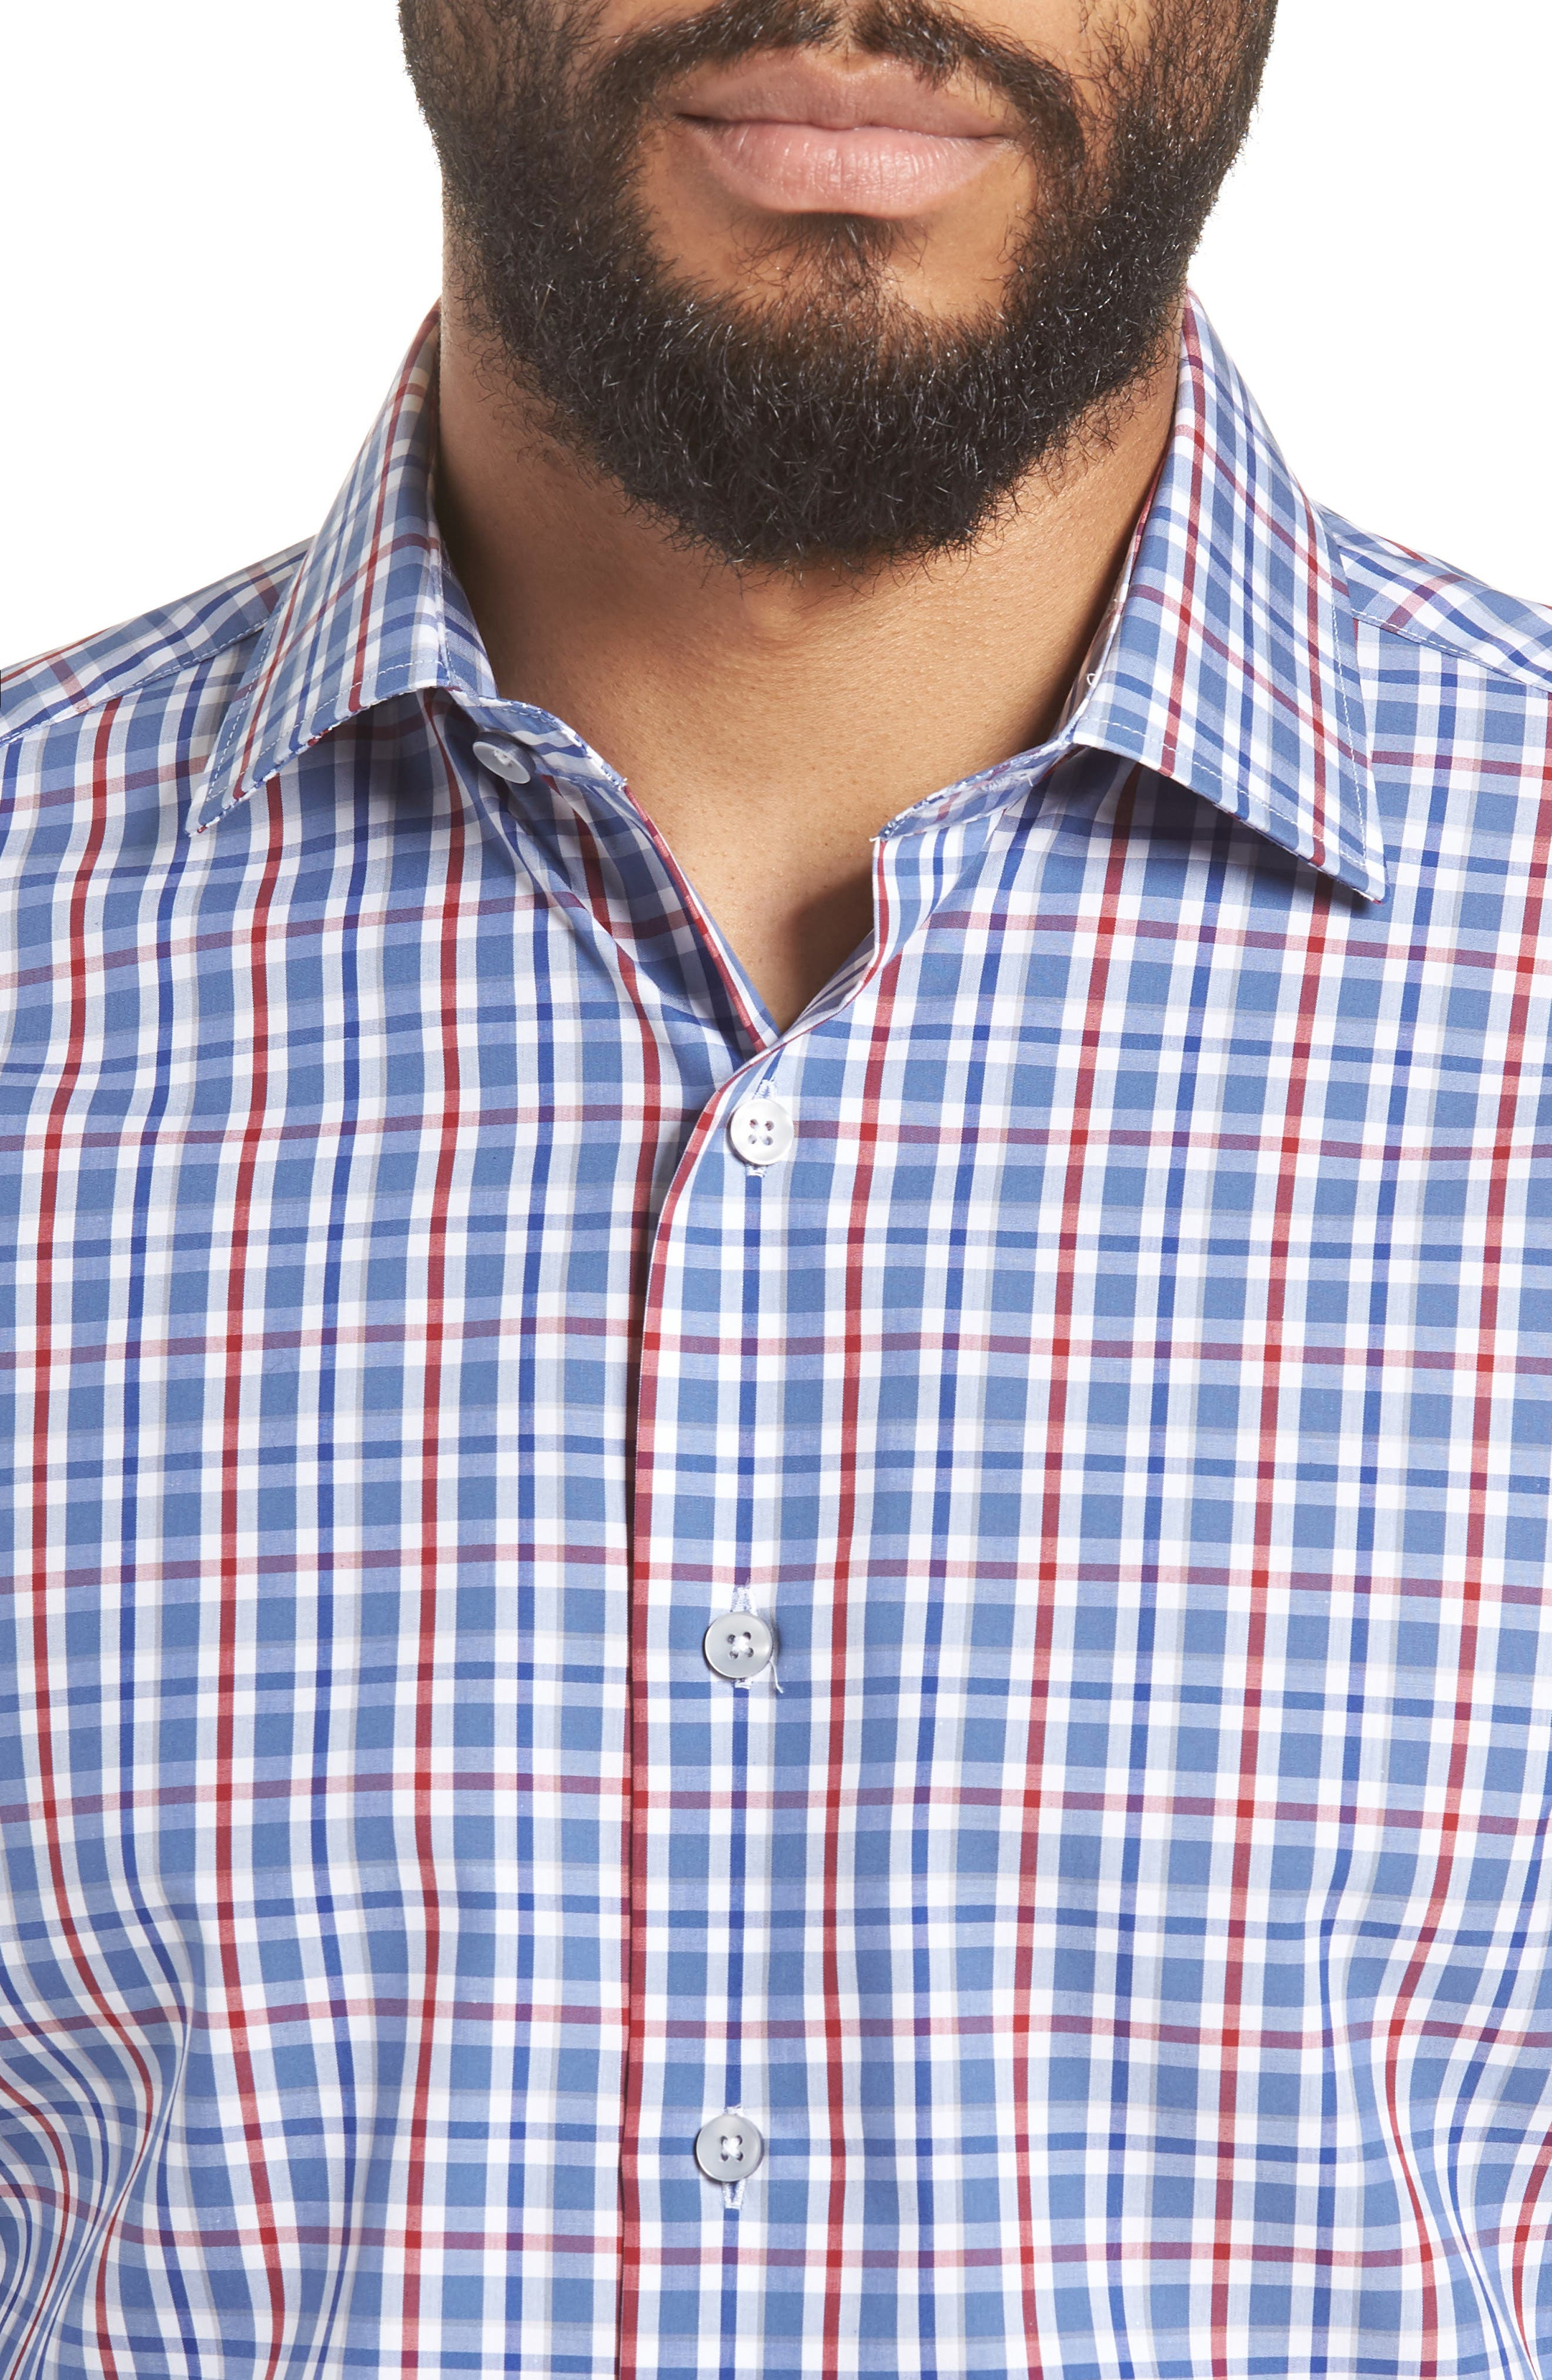 Trim Fit Plaid Dress Shirt,                             Alternate thumbnail 2, color,                             Navy/ Red